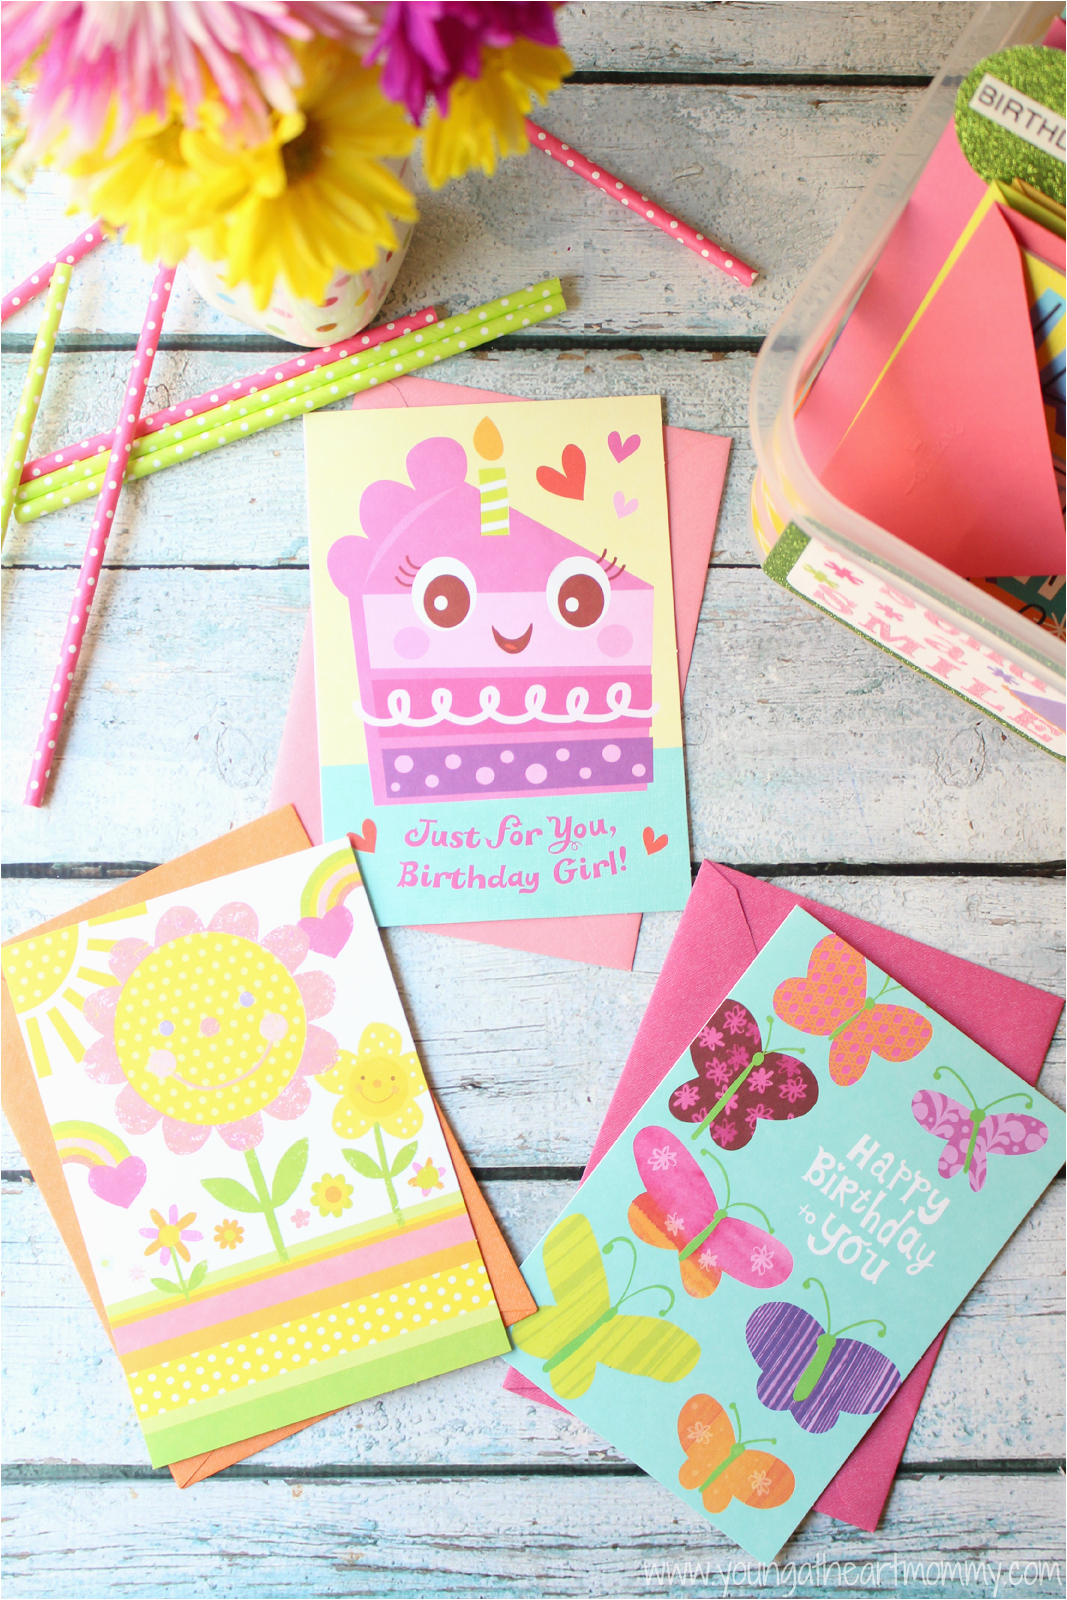 send a smile with hallmark diy greeting card organizer